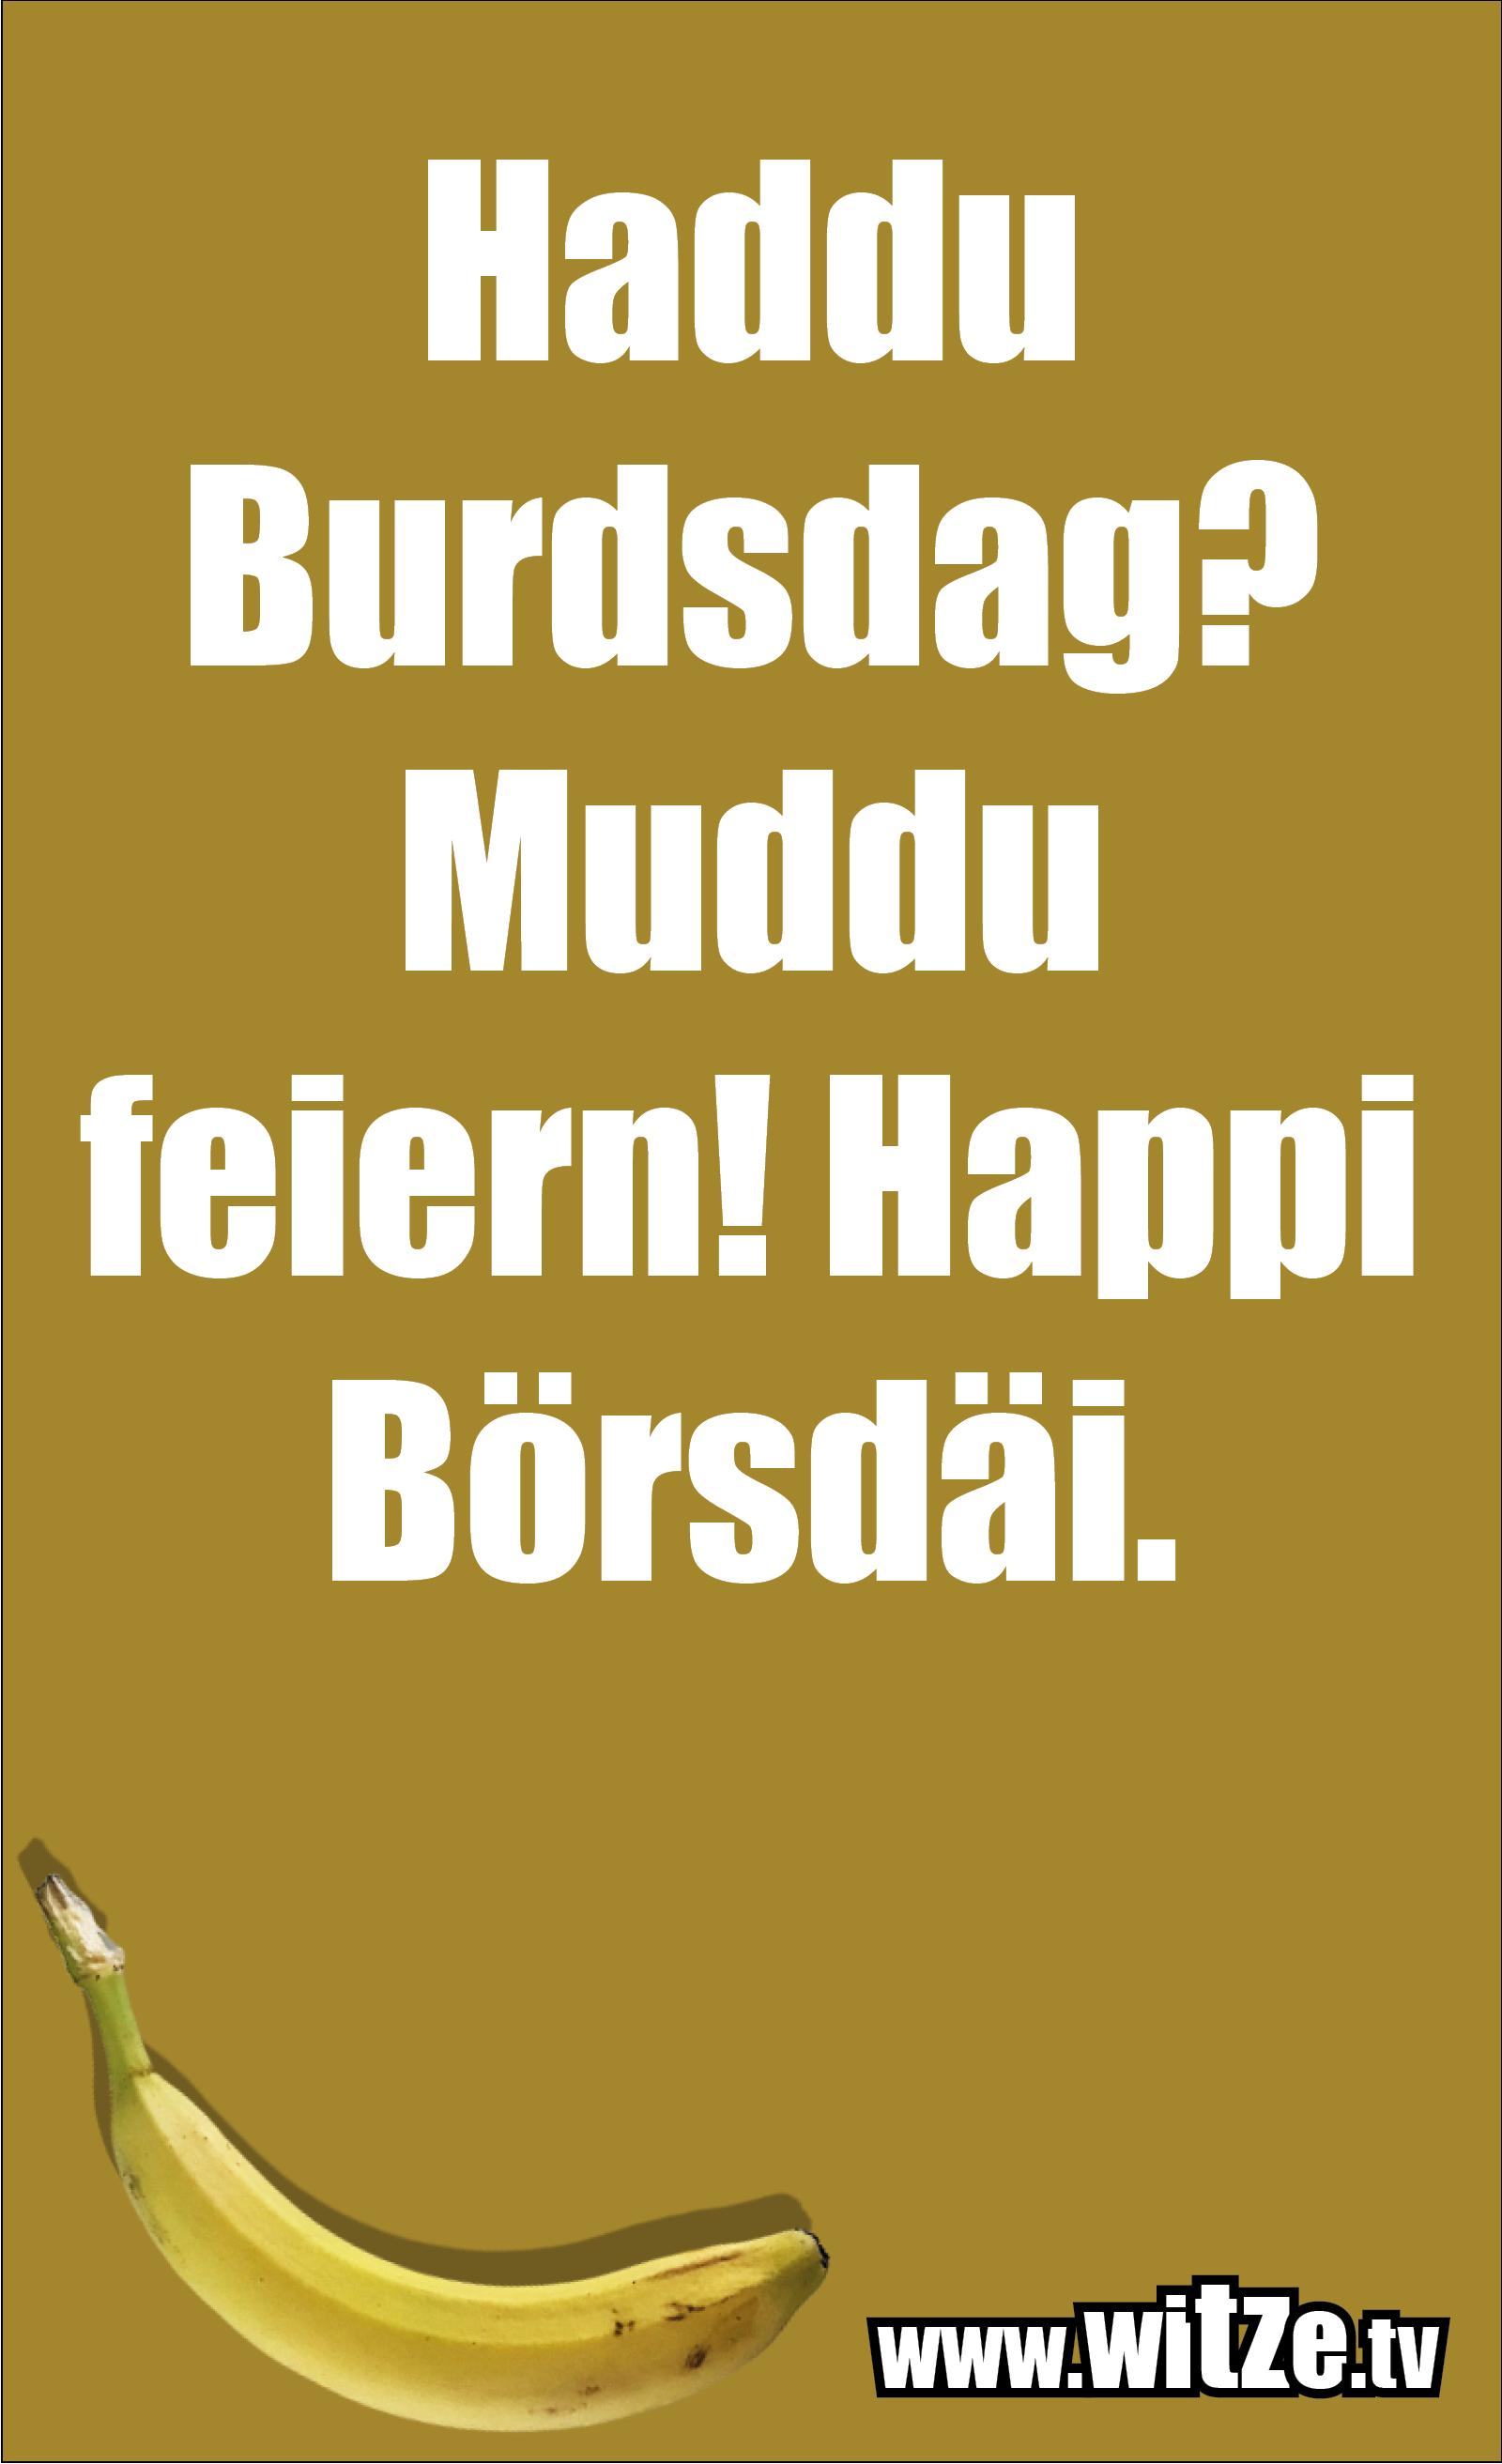 Lustige Geburtstagswünsche: Haddu Burdsdag? Muddu feiern! Happi Börsdäi.